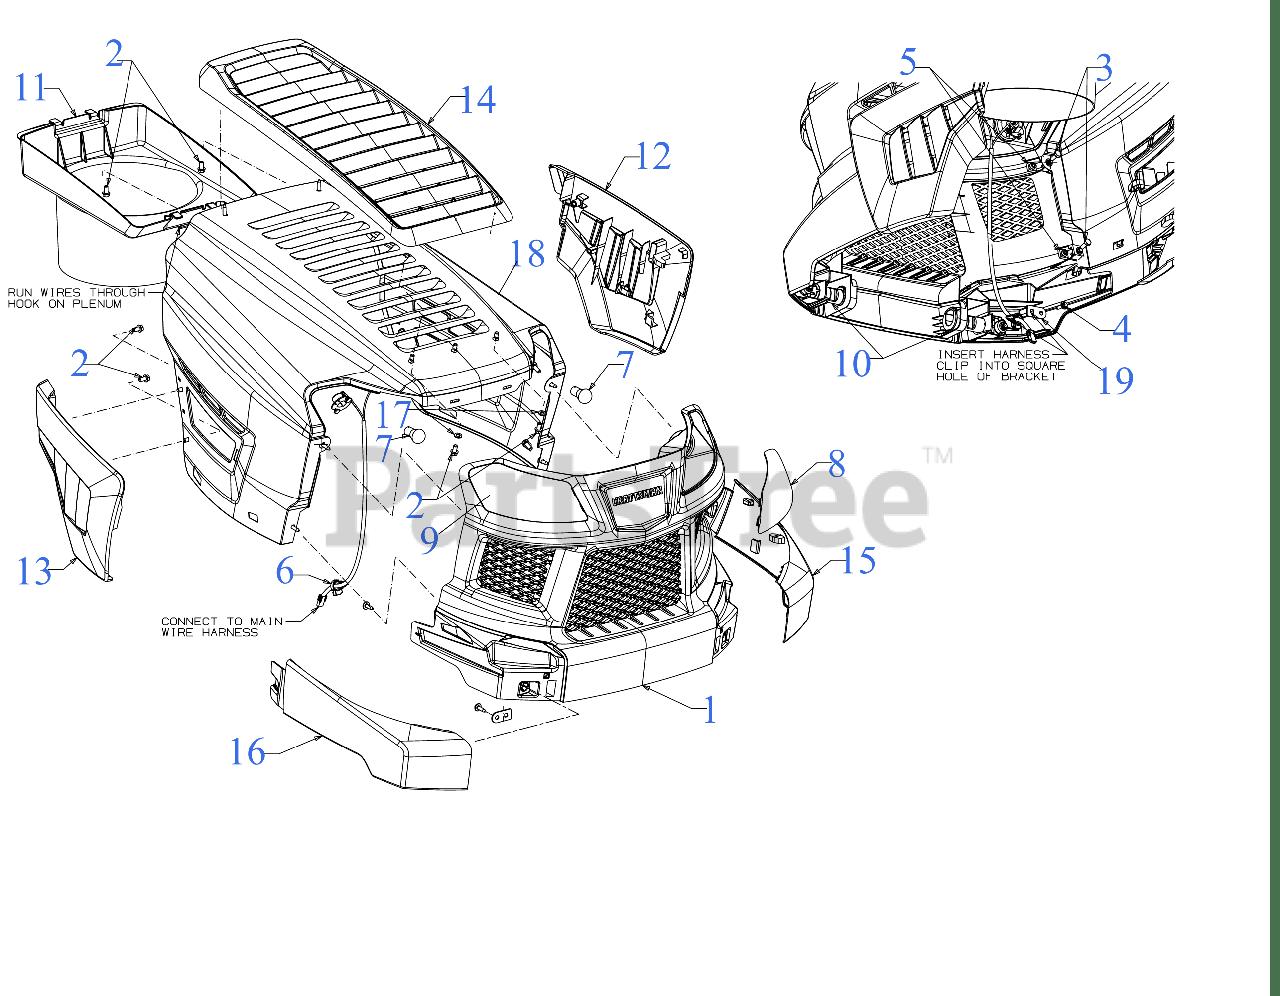 [DIAGRAM] Farmall Tractor Parts Diagram FULL Version HD